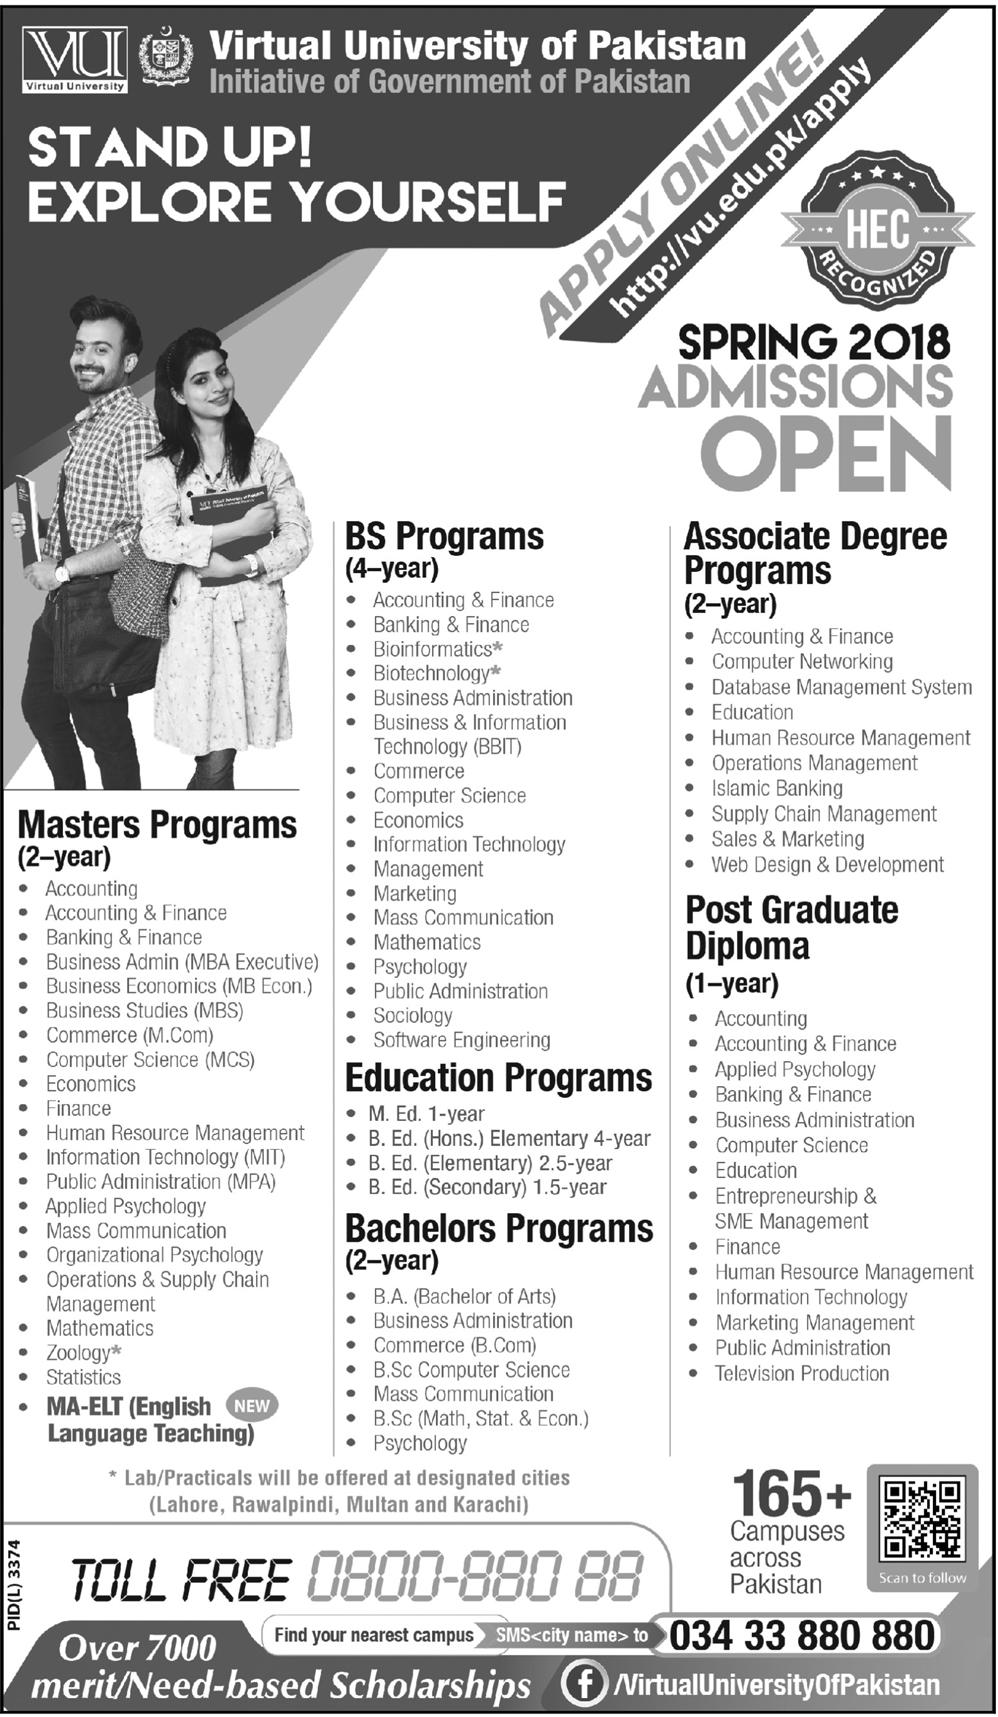 Admission Open In Virtual University Of Pakistan 19 Feb 2018